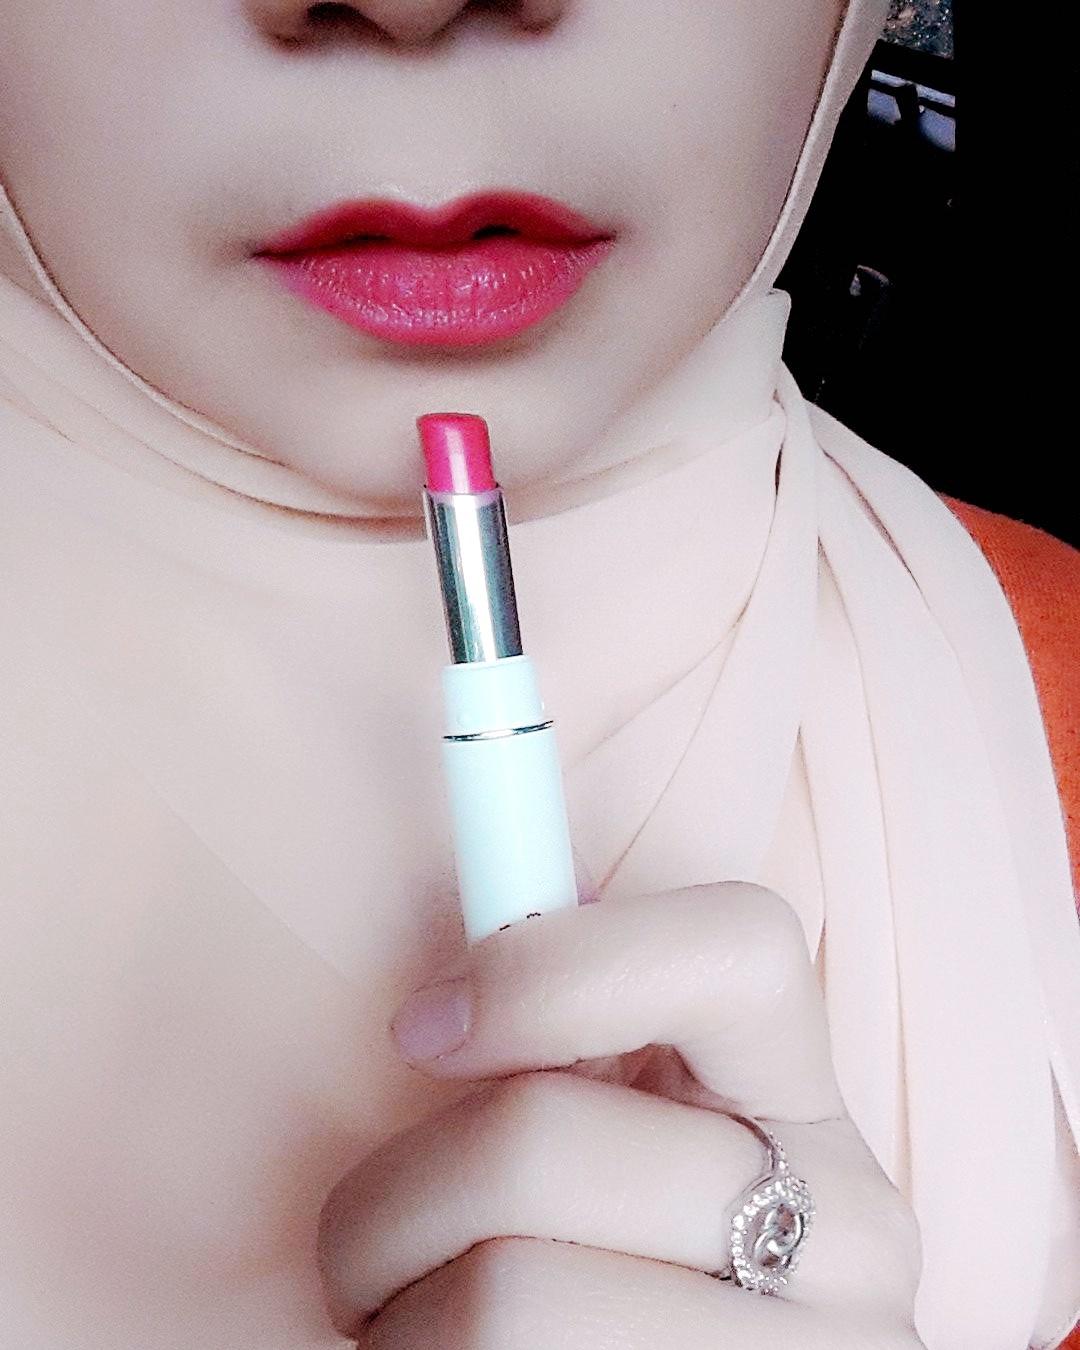 Zoya Cosmetics Ultramatte Lip Pink Paradise 09 Spec Dan Daftar Ultramoisse Strawbeery Ice 04 Tapi Saya Suka Warnanya Dari Lipstick Ini Meski Terlalu Gonjreng Di Bibir